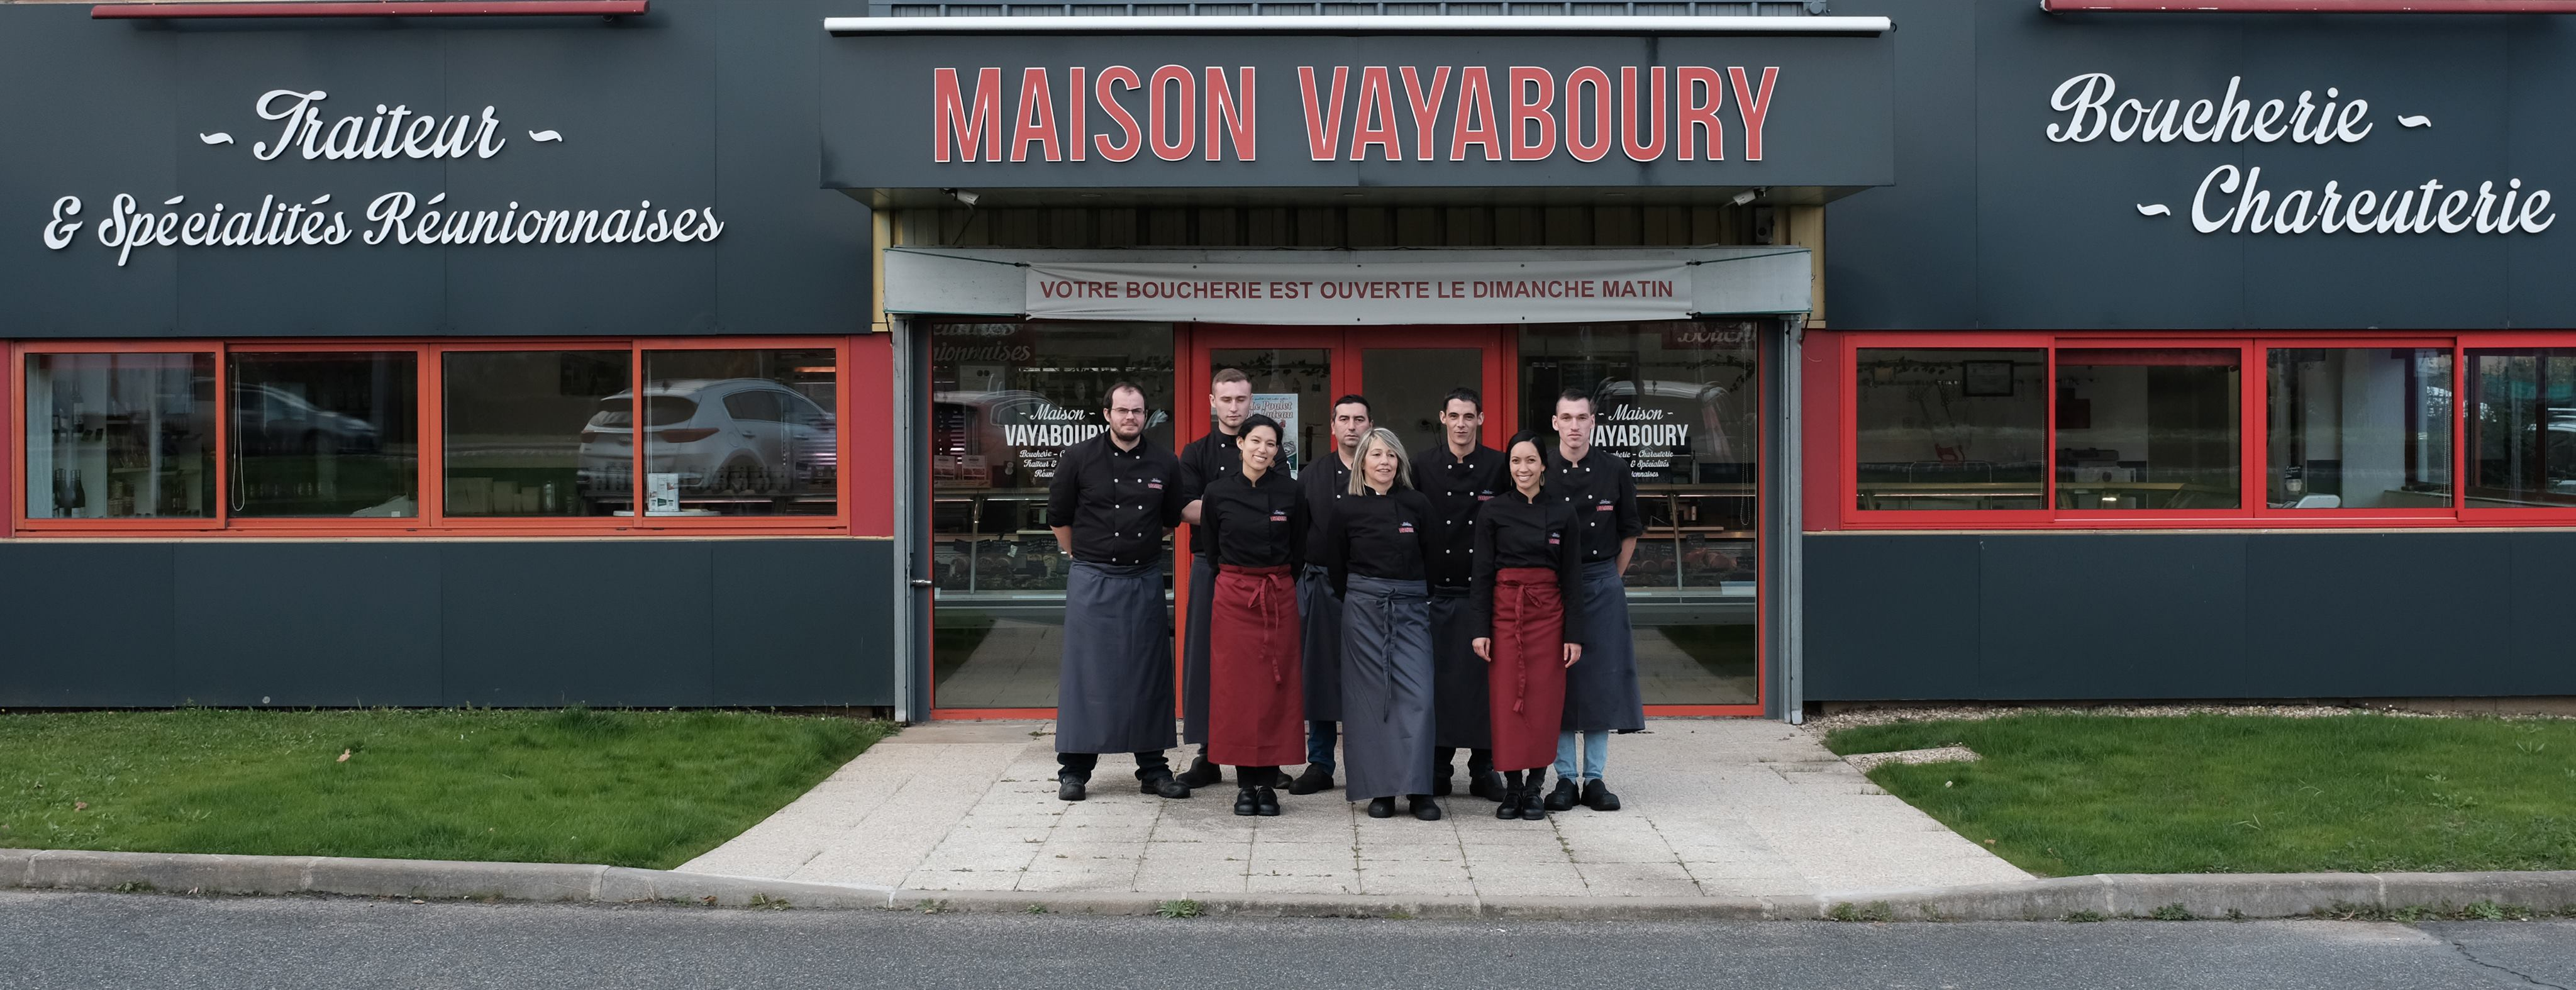 equipe vayaboury